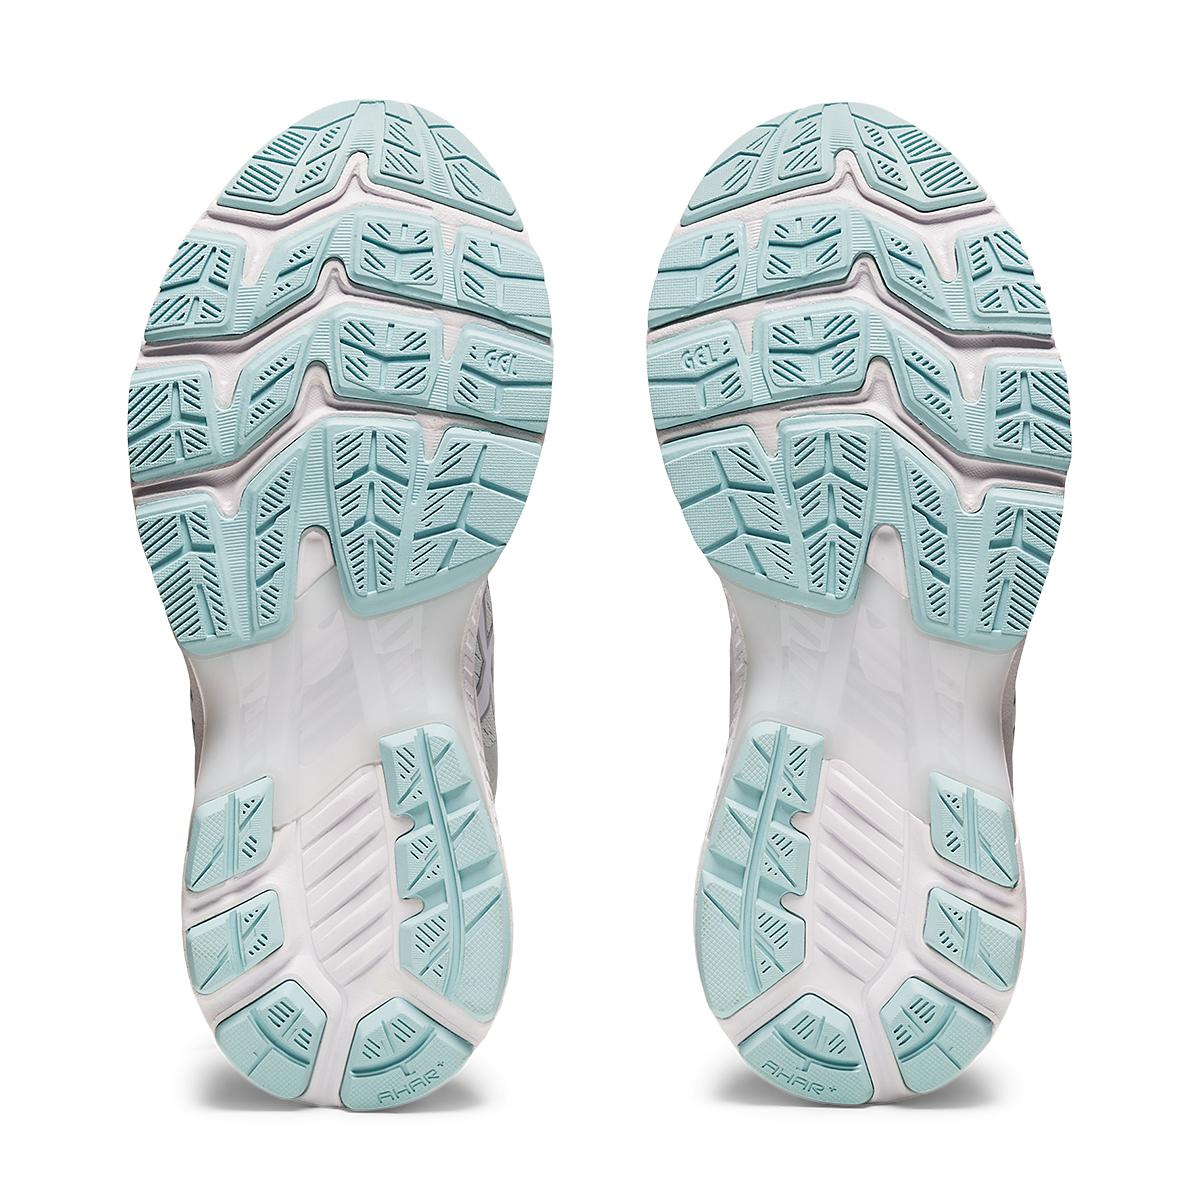 Women's Asics GEL-Kayano 27 Running Shoe - Color: Glacier Grey/White - Size: 6 - Width: Regular, Glacier Grey/White, large, image 7